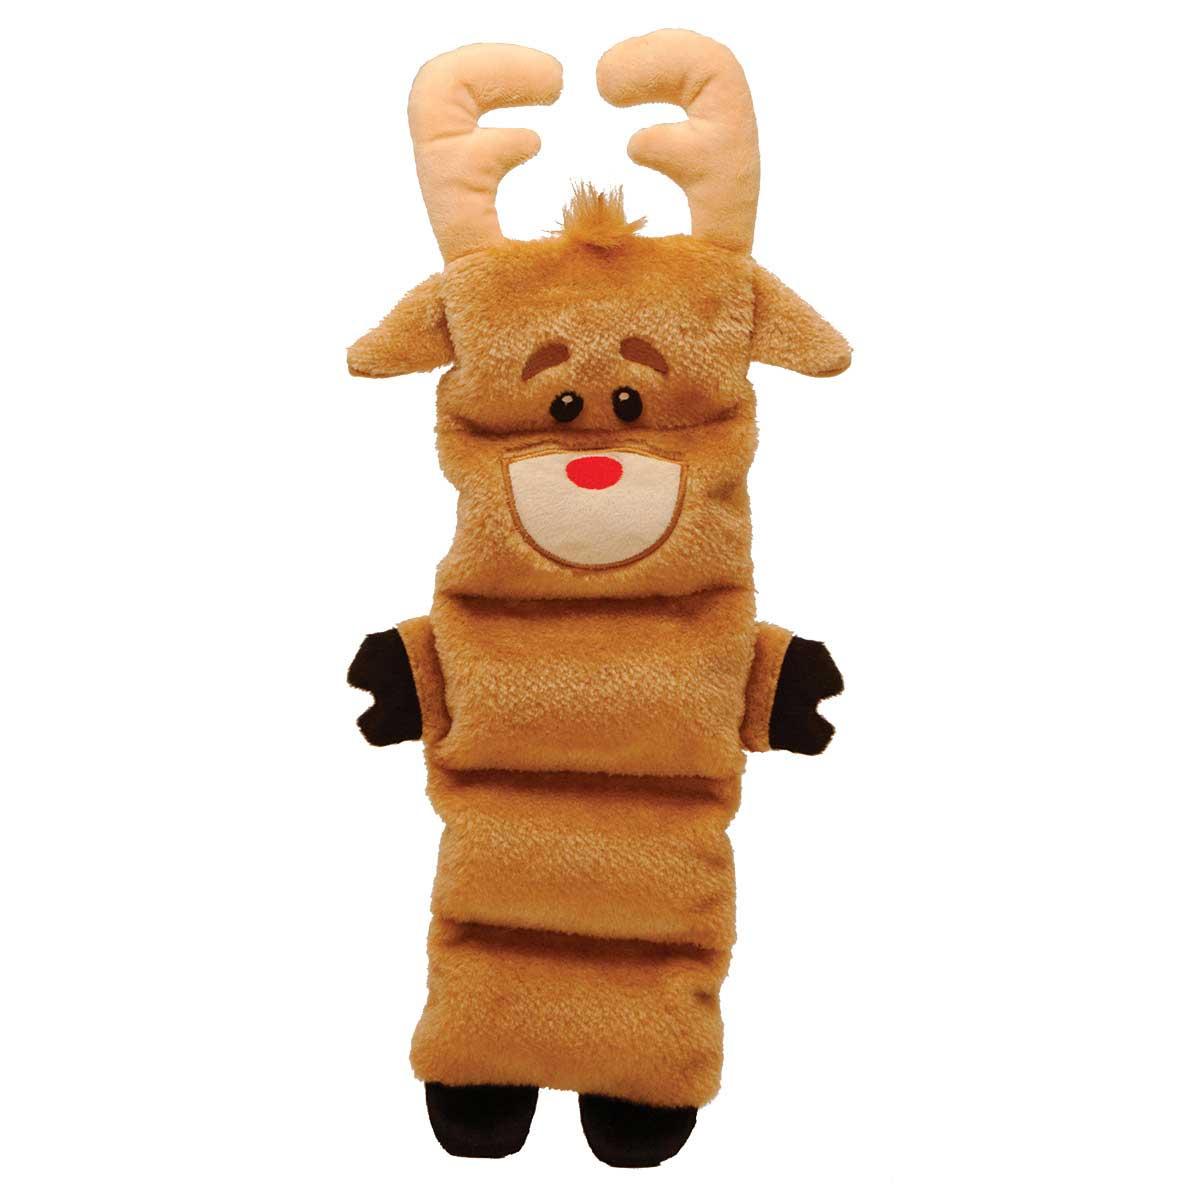 Outward Hound Holiday Invincibles Reindeer Dog Toy